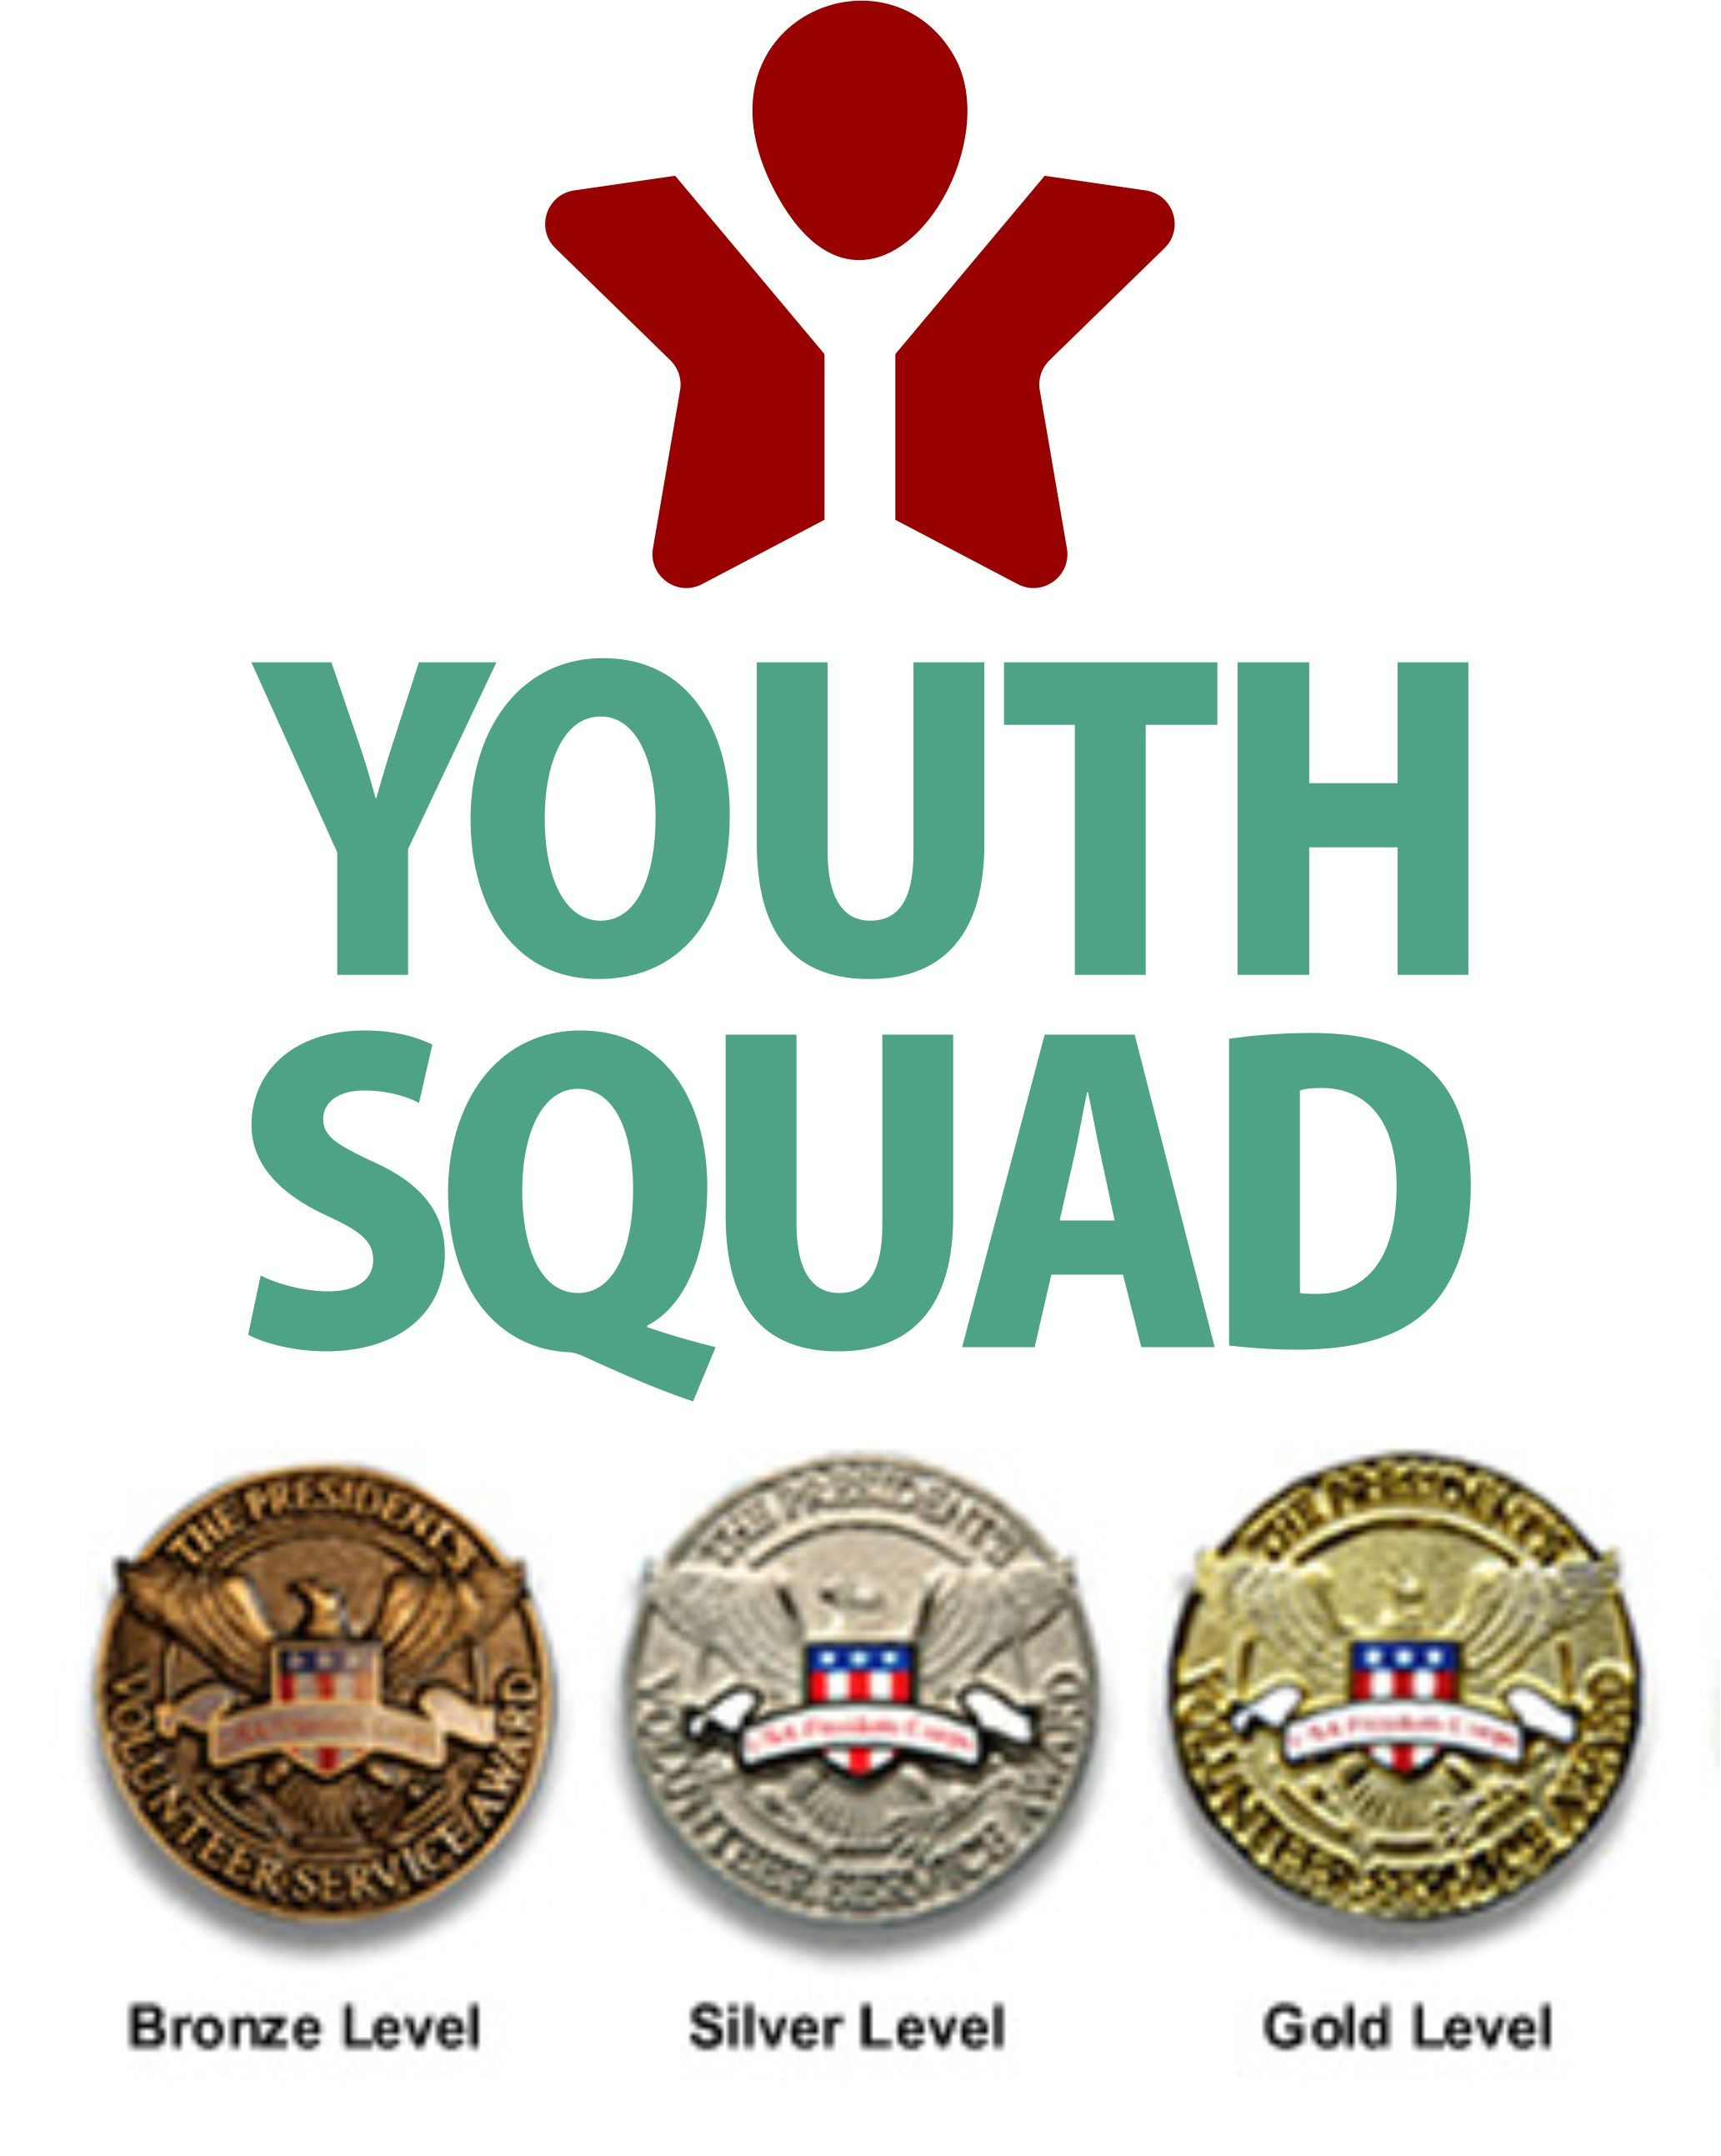 Youth Squad Membership Community service ideas